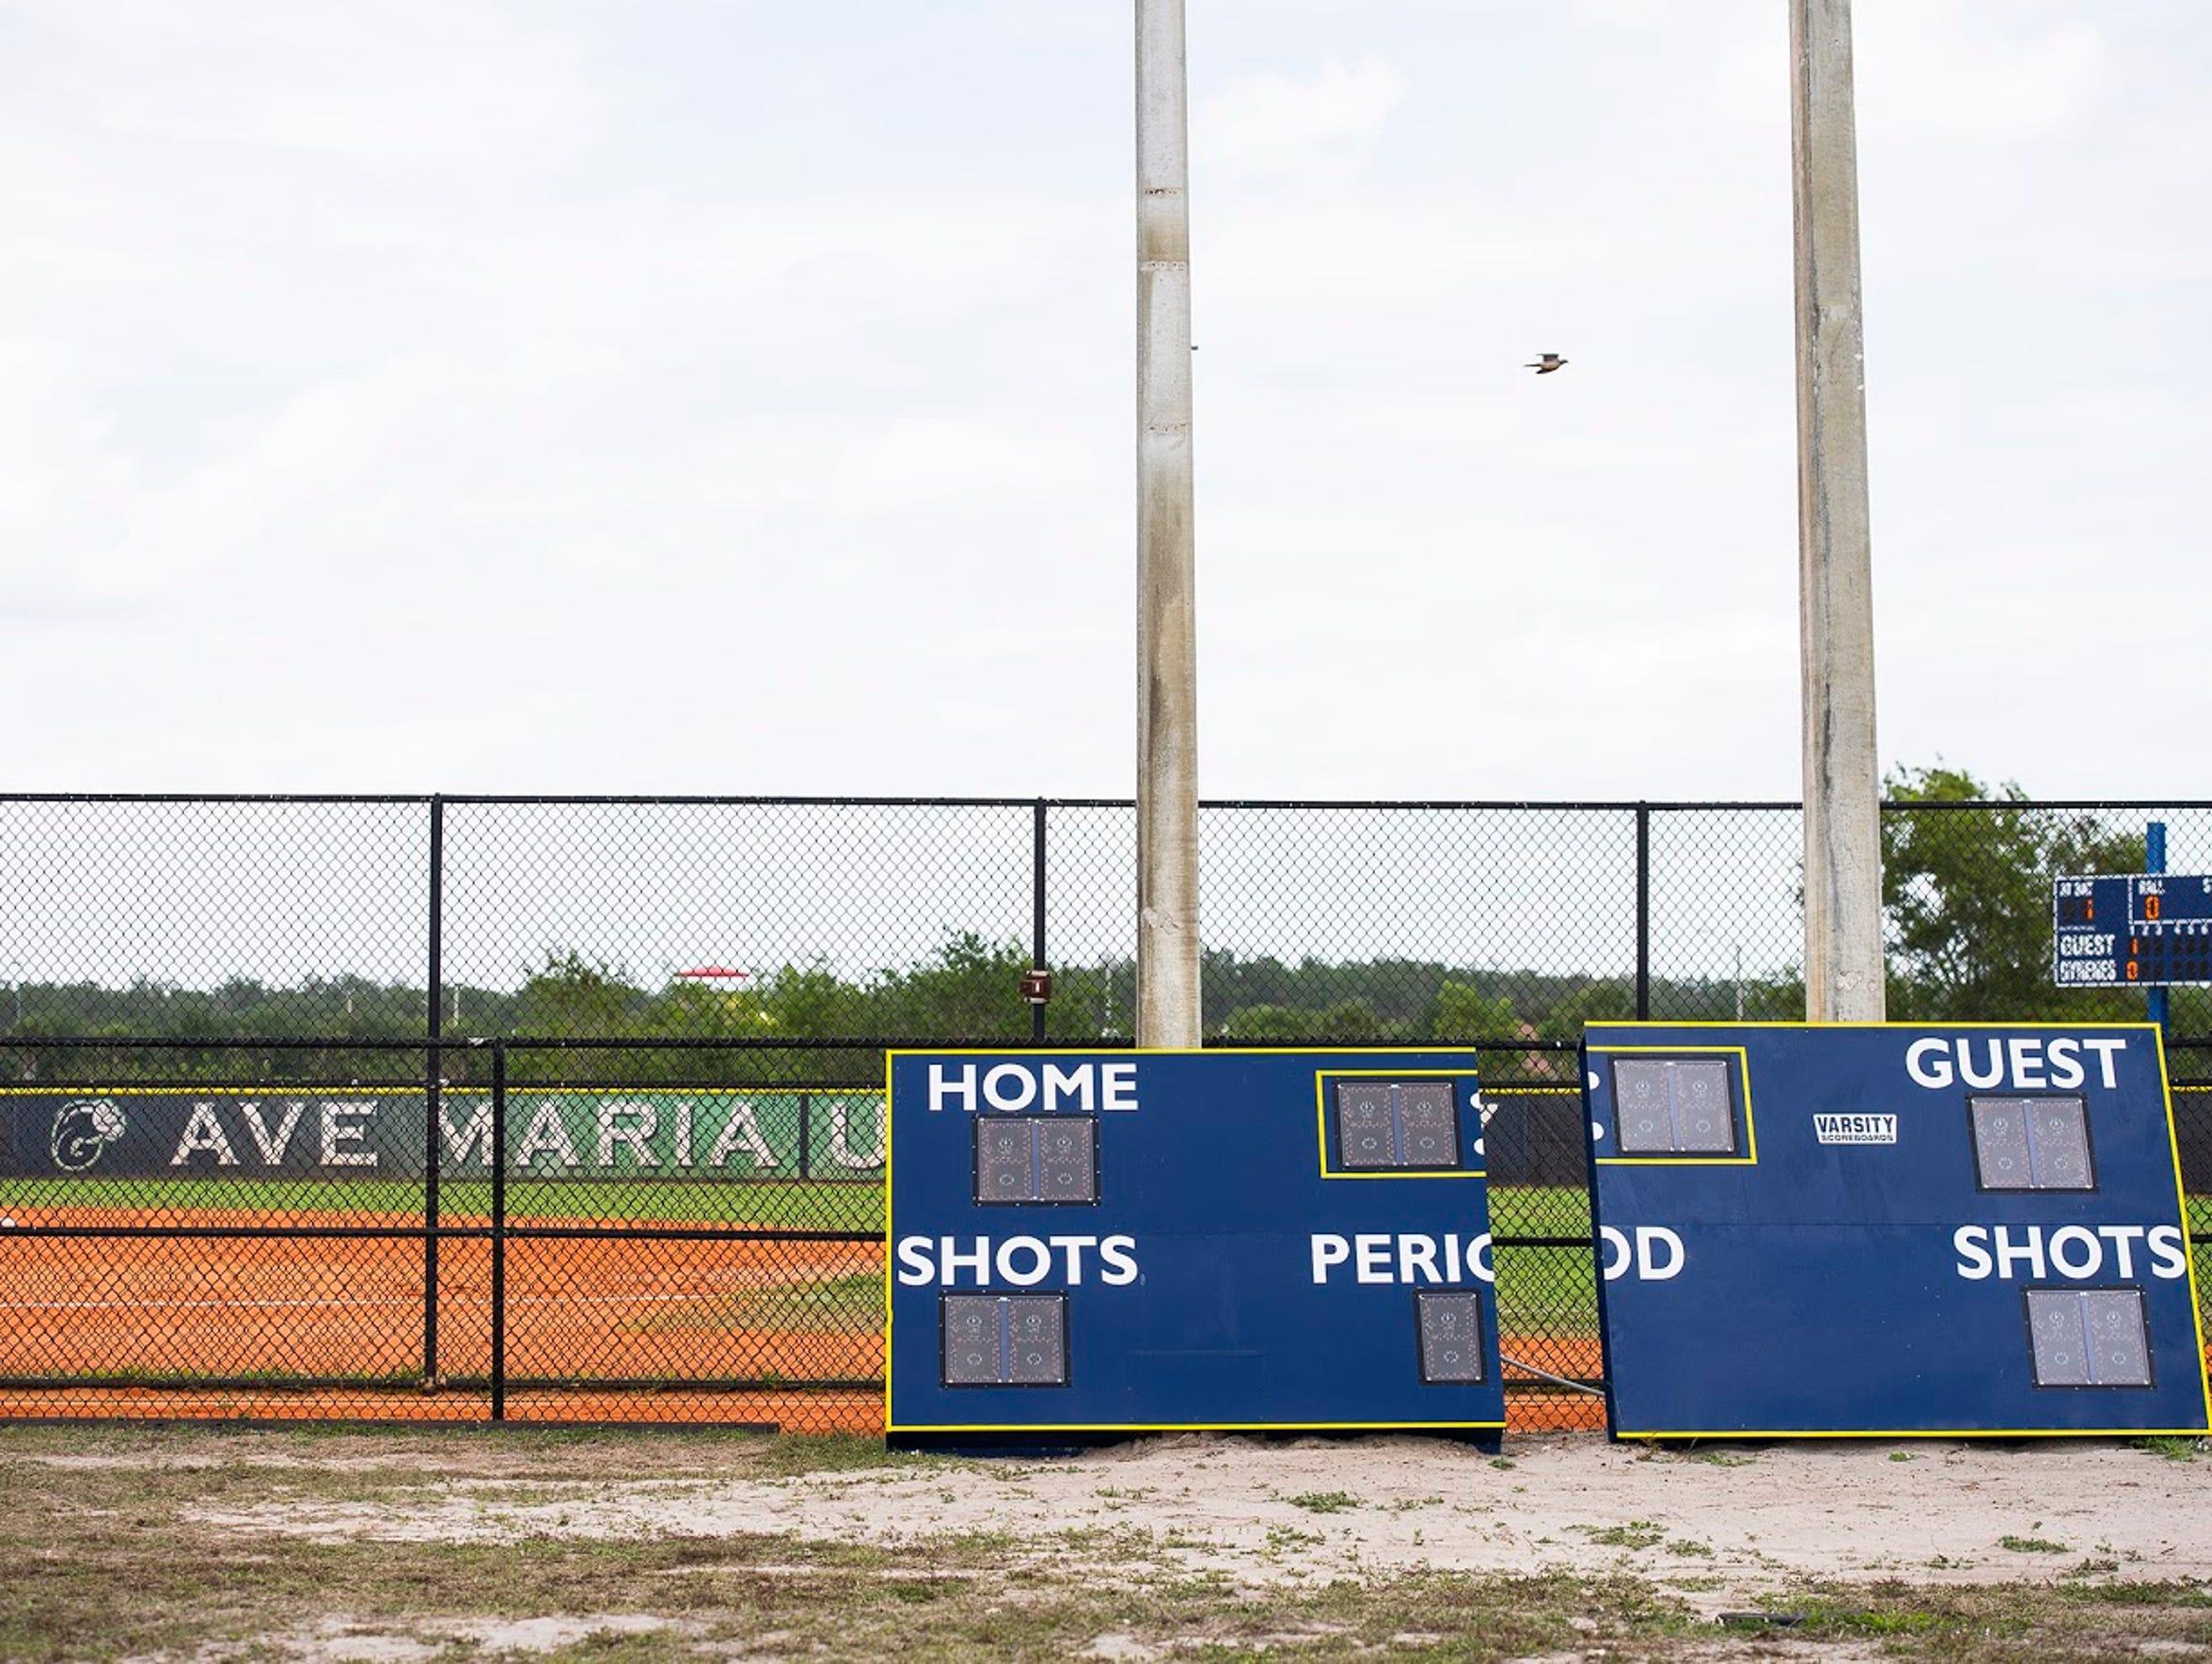 Ave Maria softball